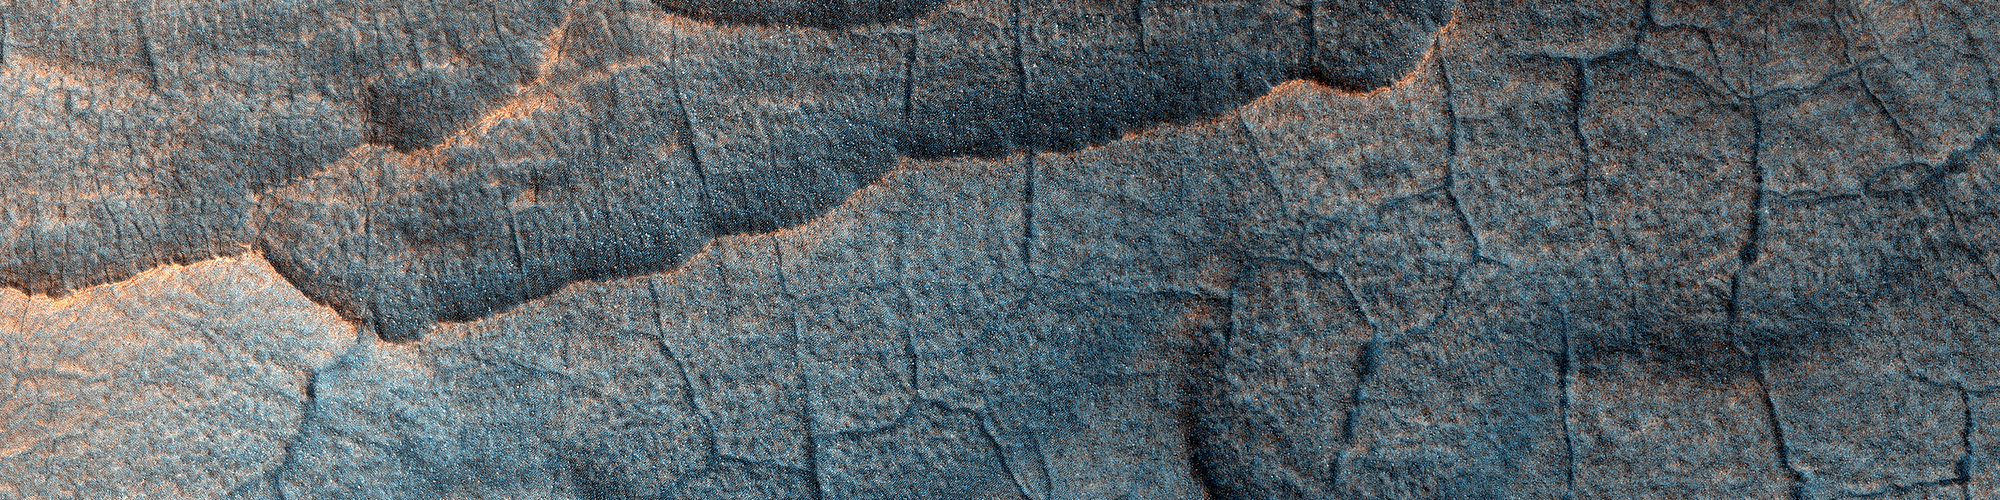 Die Oberfl�che von Utopia Planitia